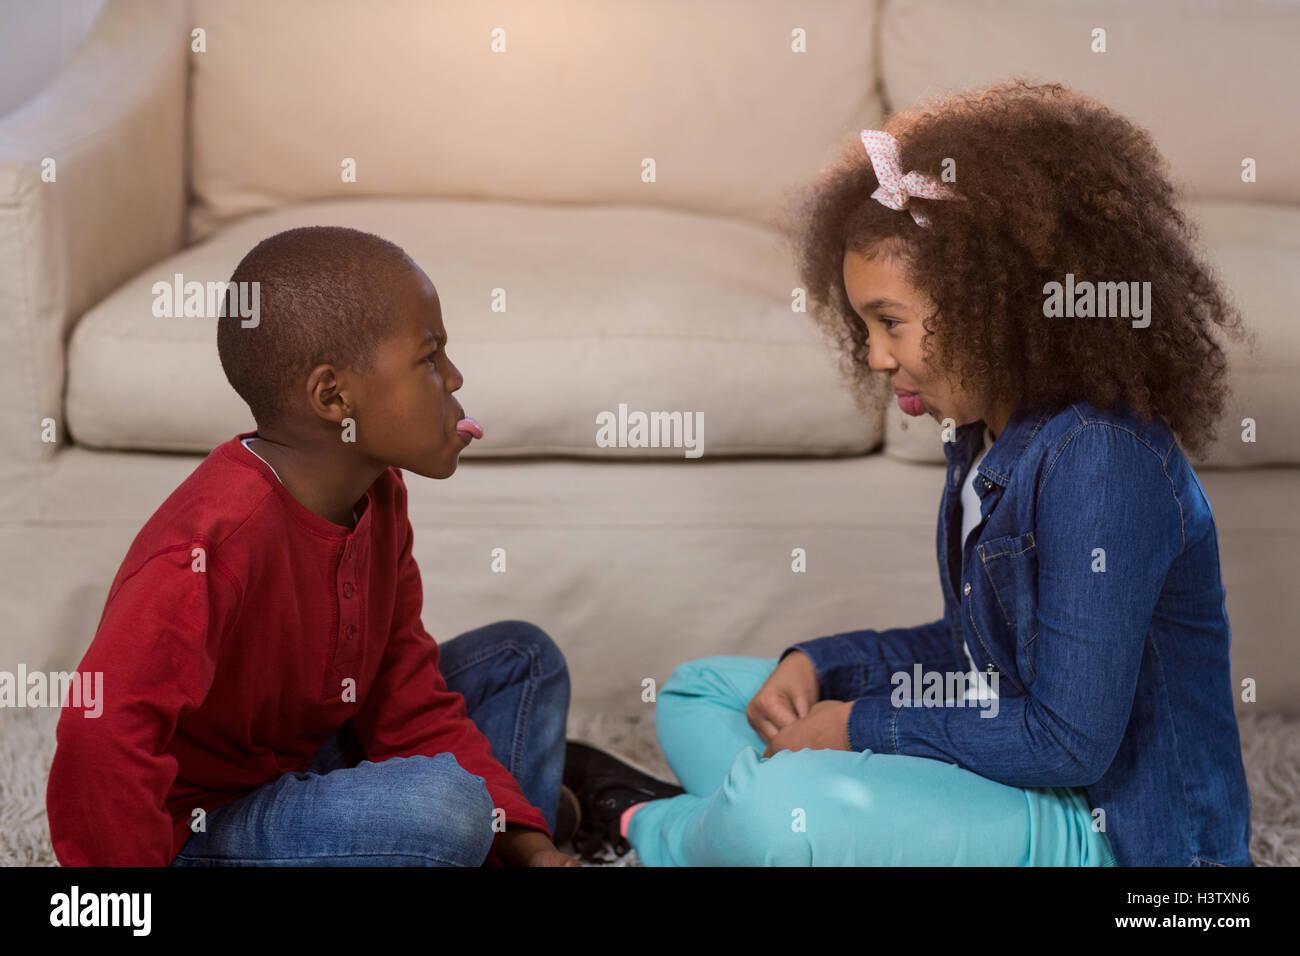 Children teasing each other - Stock Image